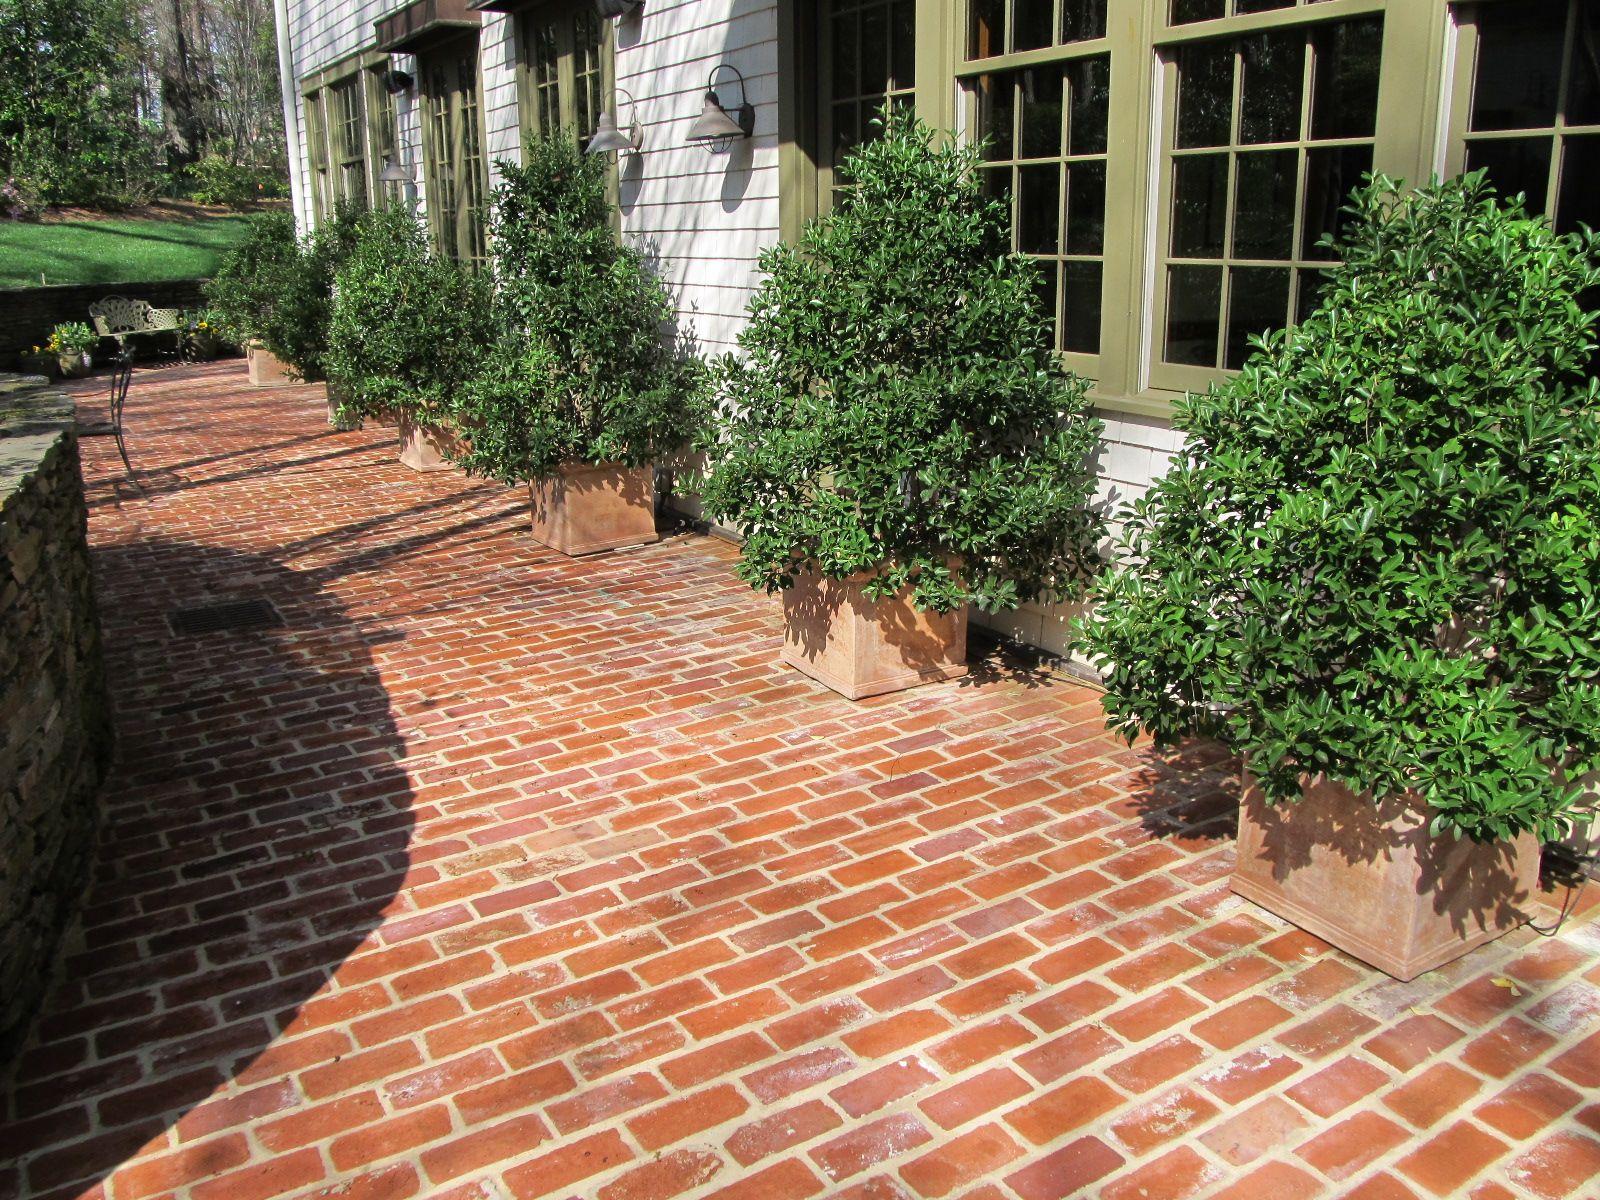 Pin By Botanica Atlanta On Atlanta Gardens And Landscapes Backyard Garden Landscape Patio Landscaping Brick Patios